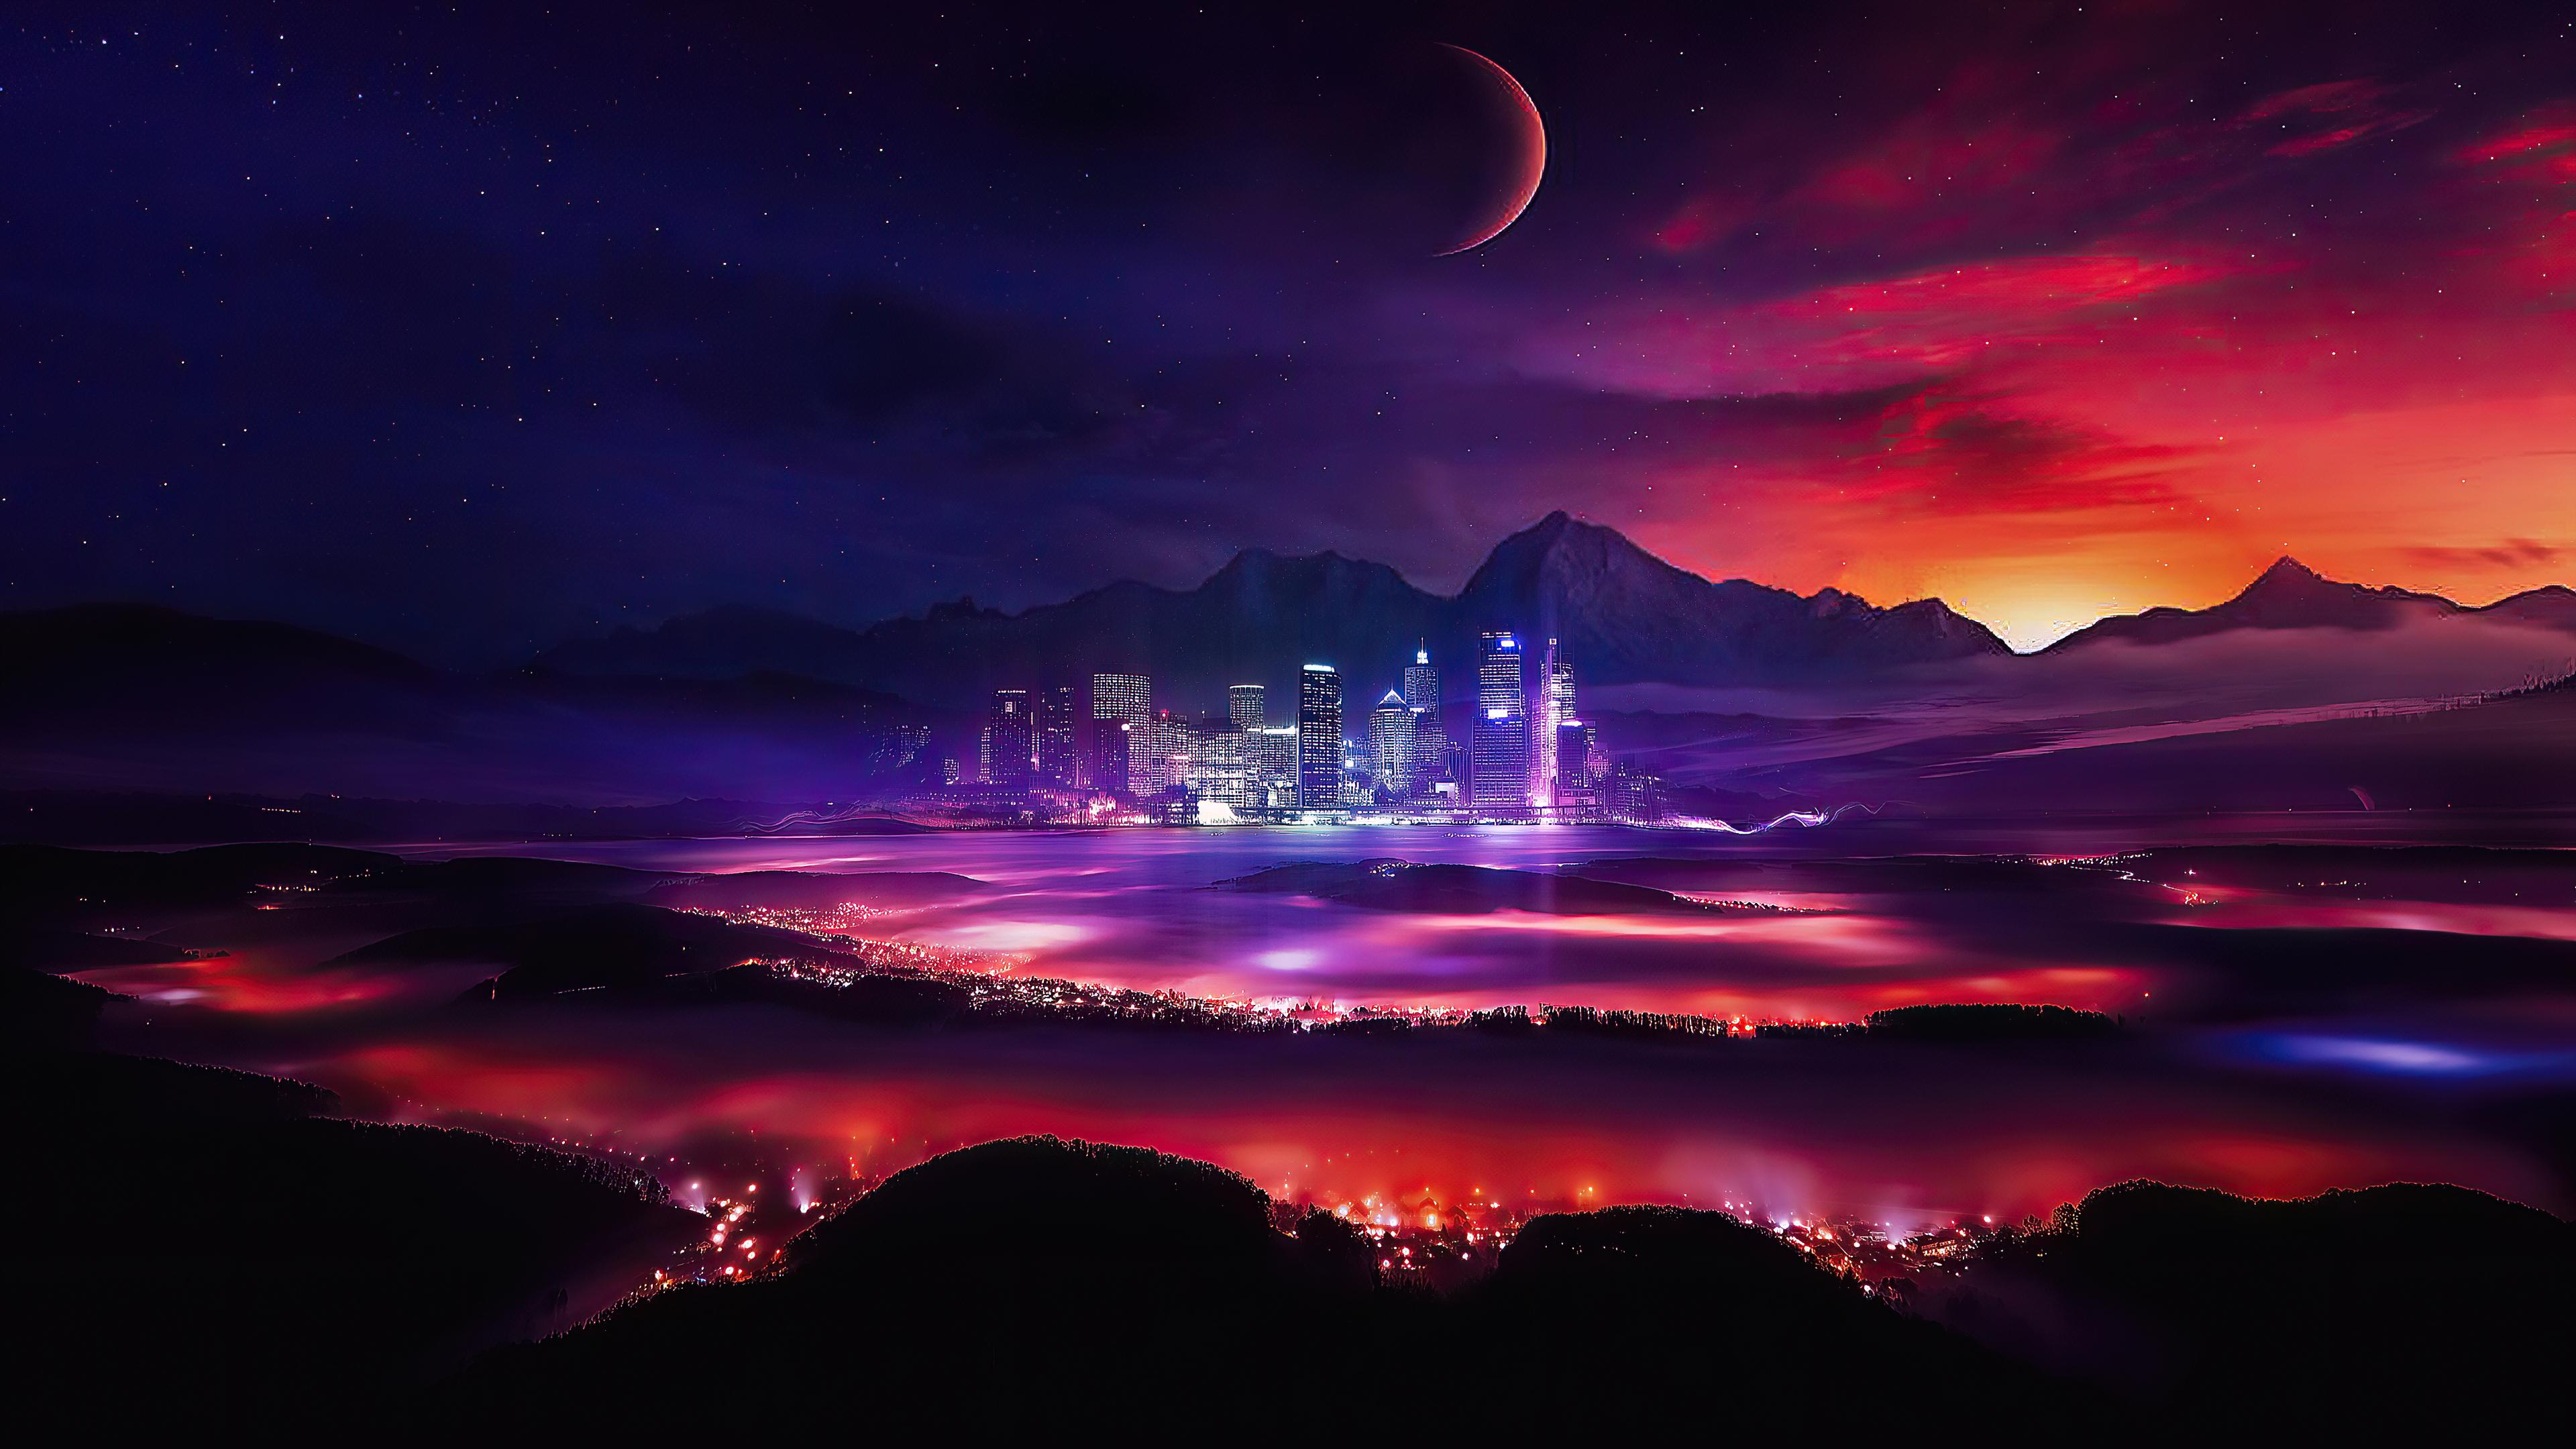 Night Moon Sky Mountain 3840x2160